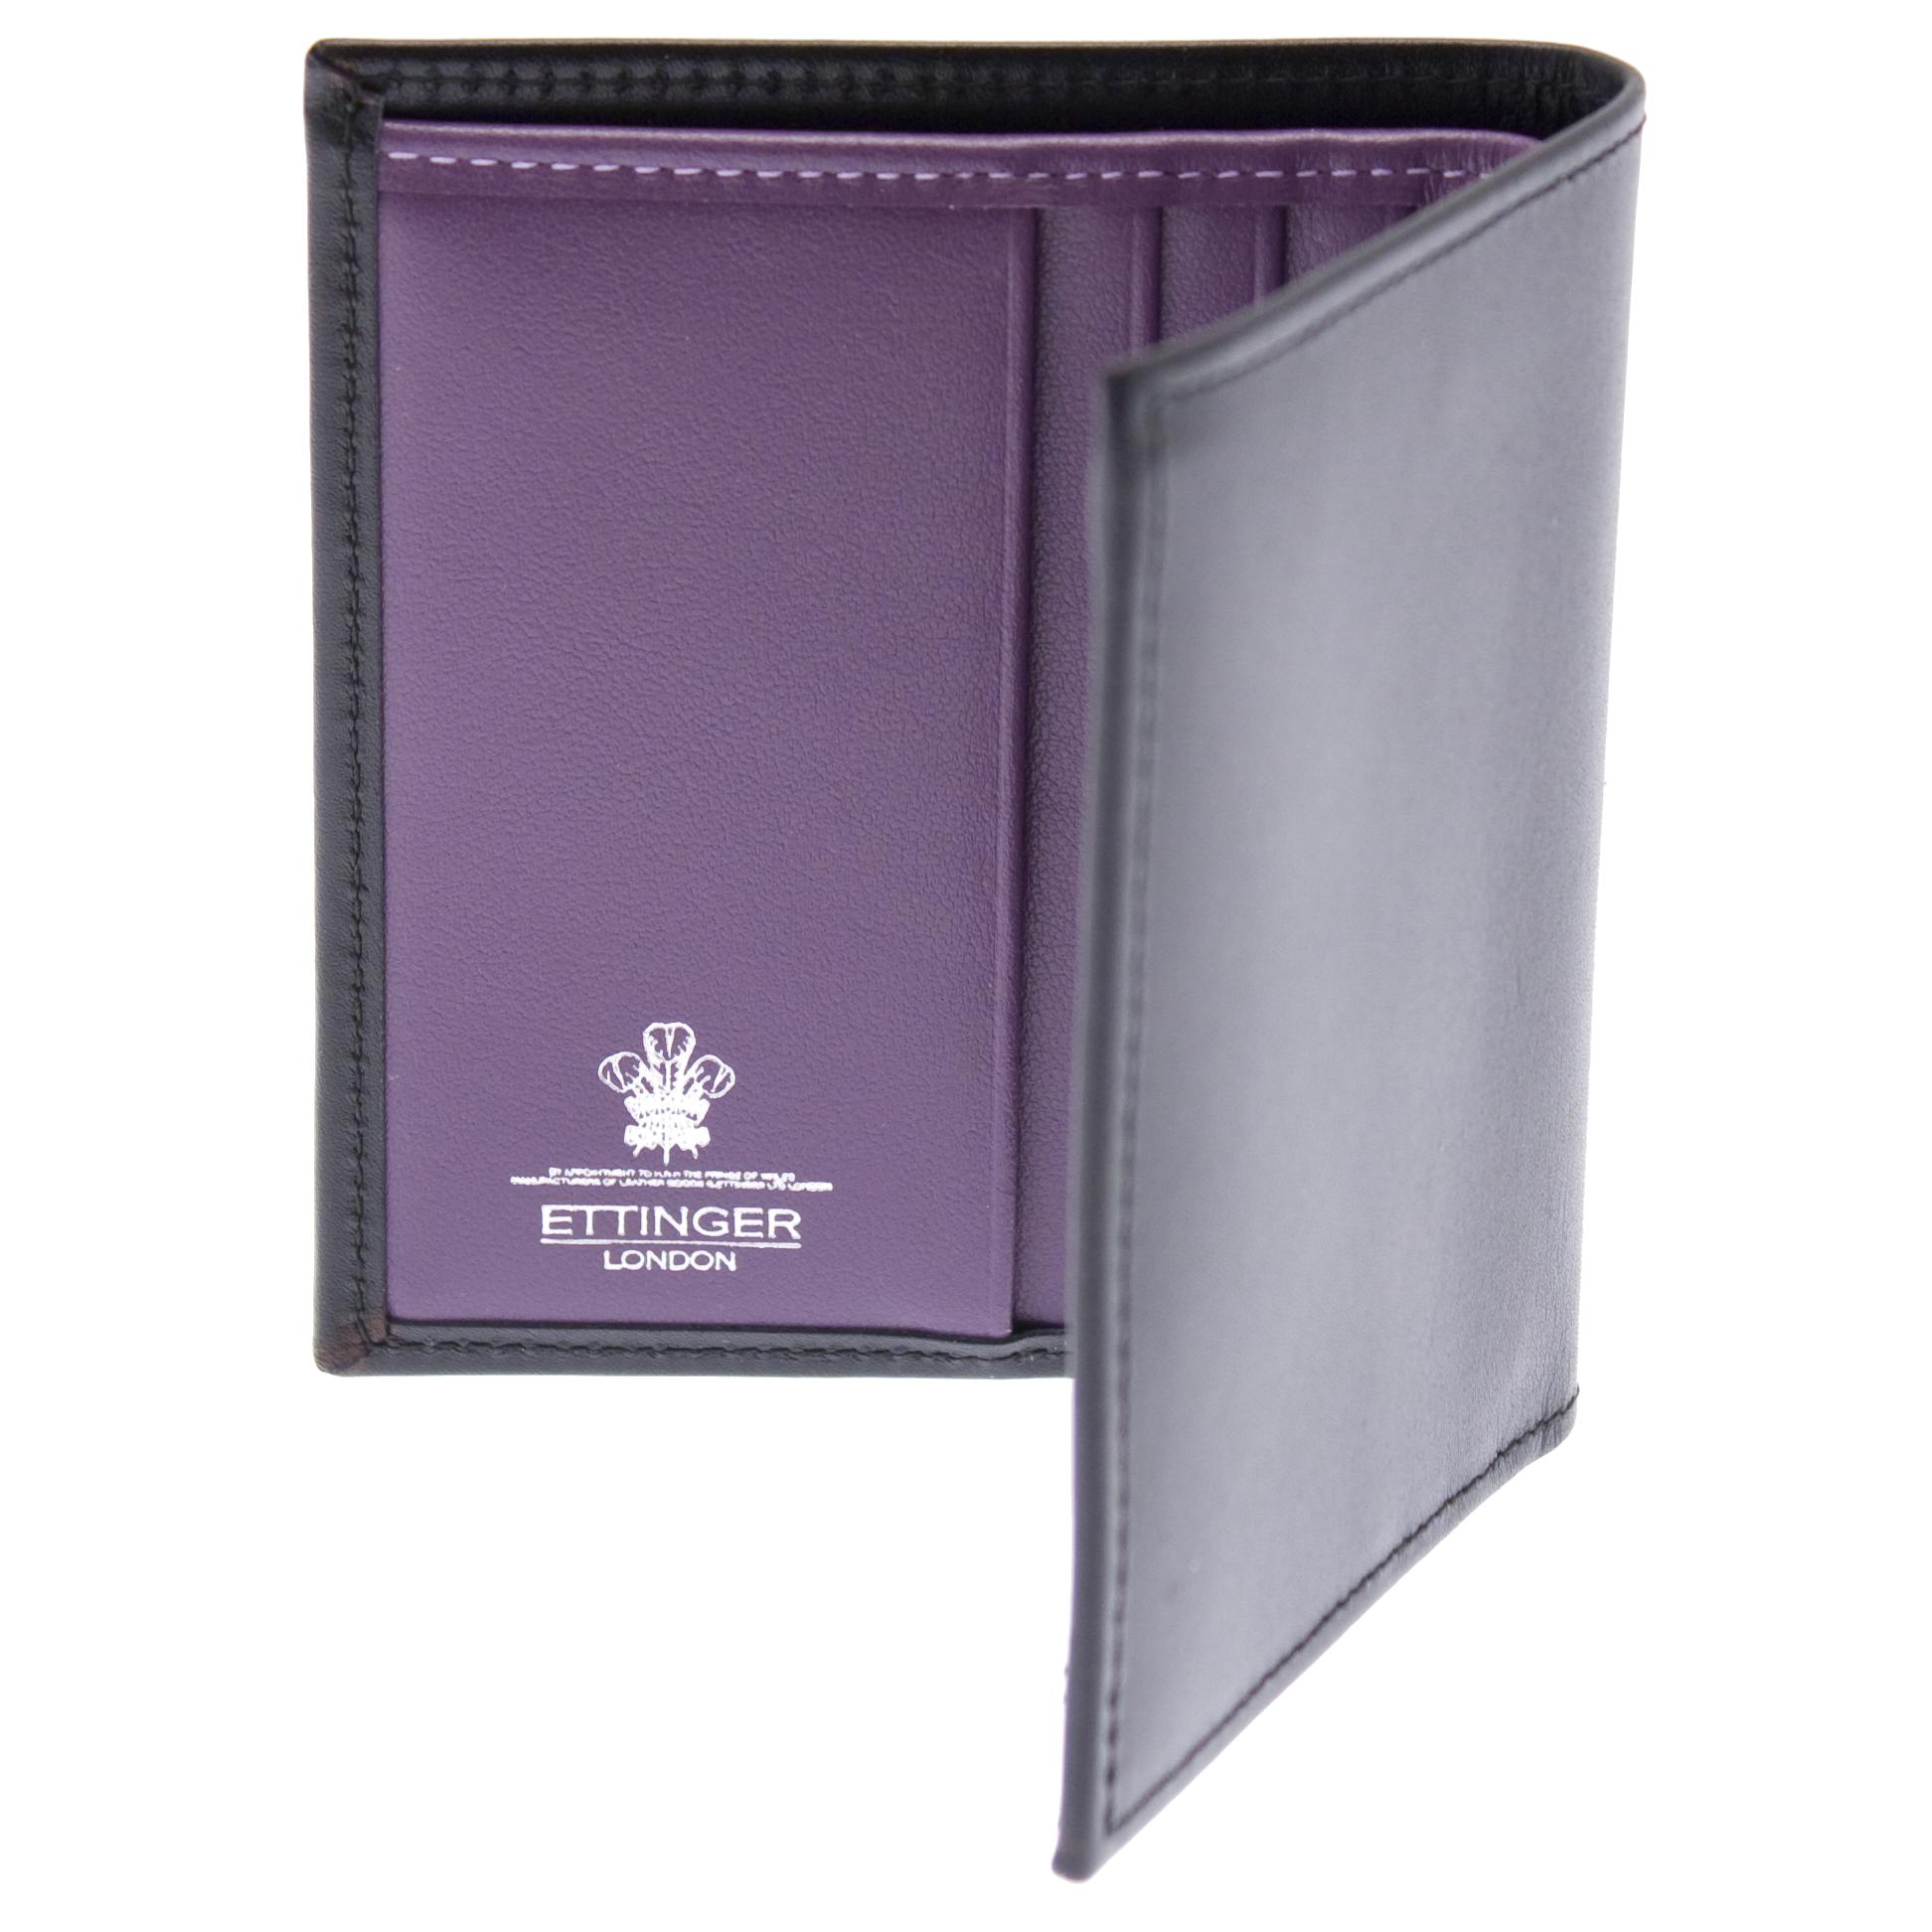 Ettinger Leather Mini Wallet Black With Purple Interior Ebay